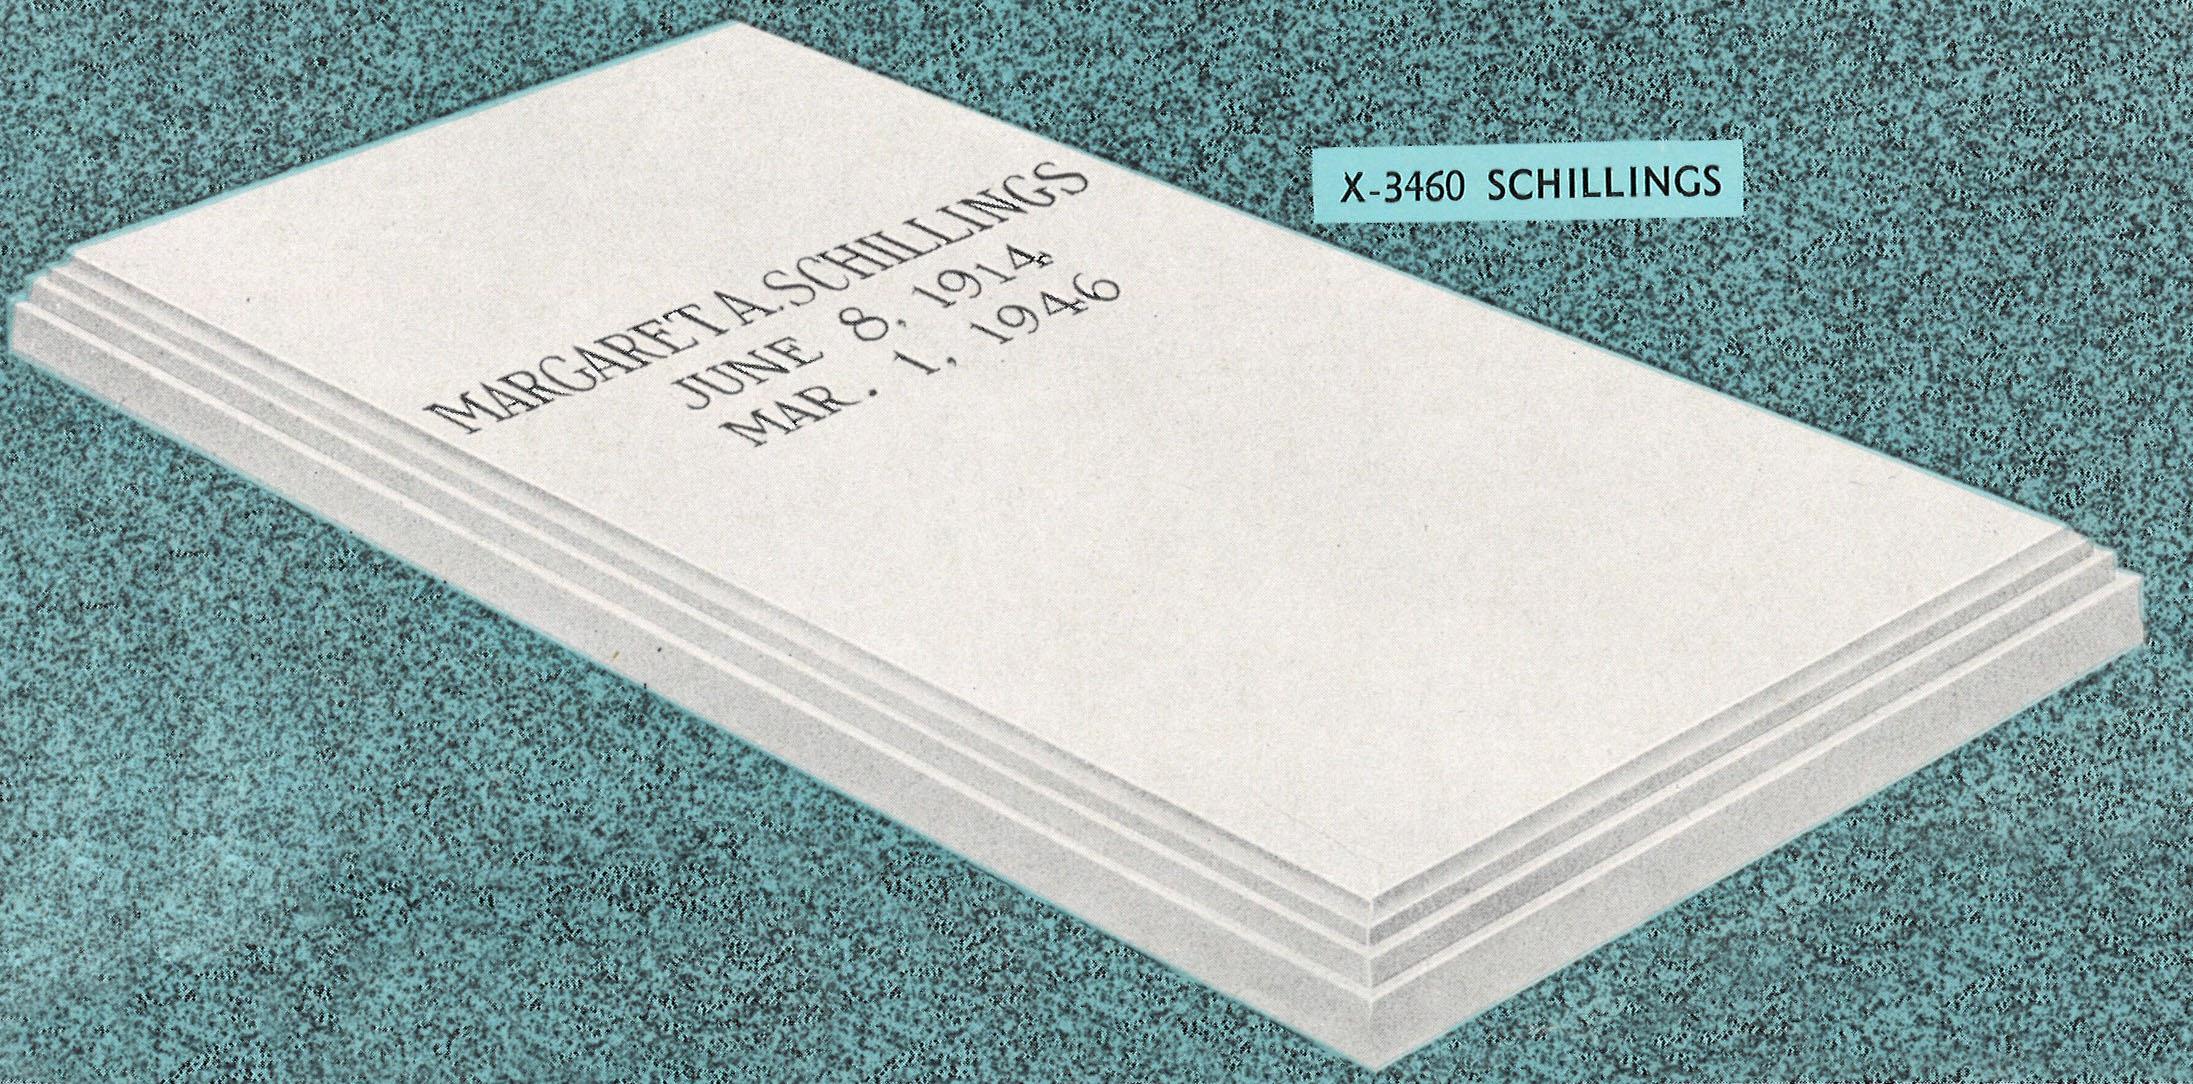 X-3460 Schillings